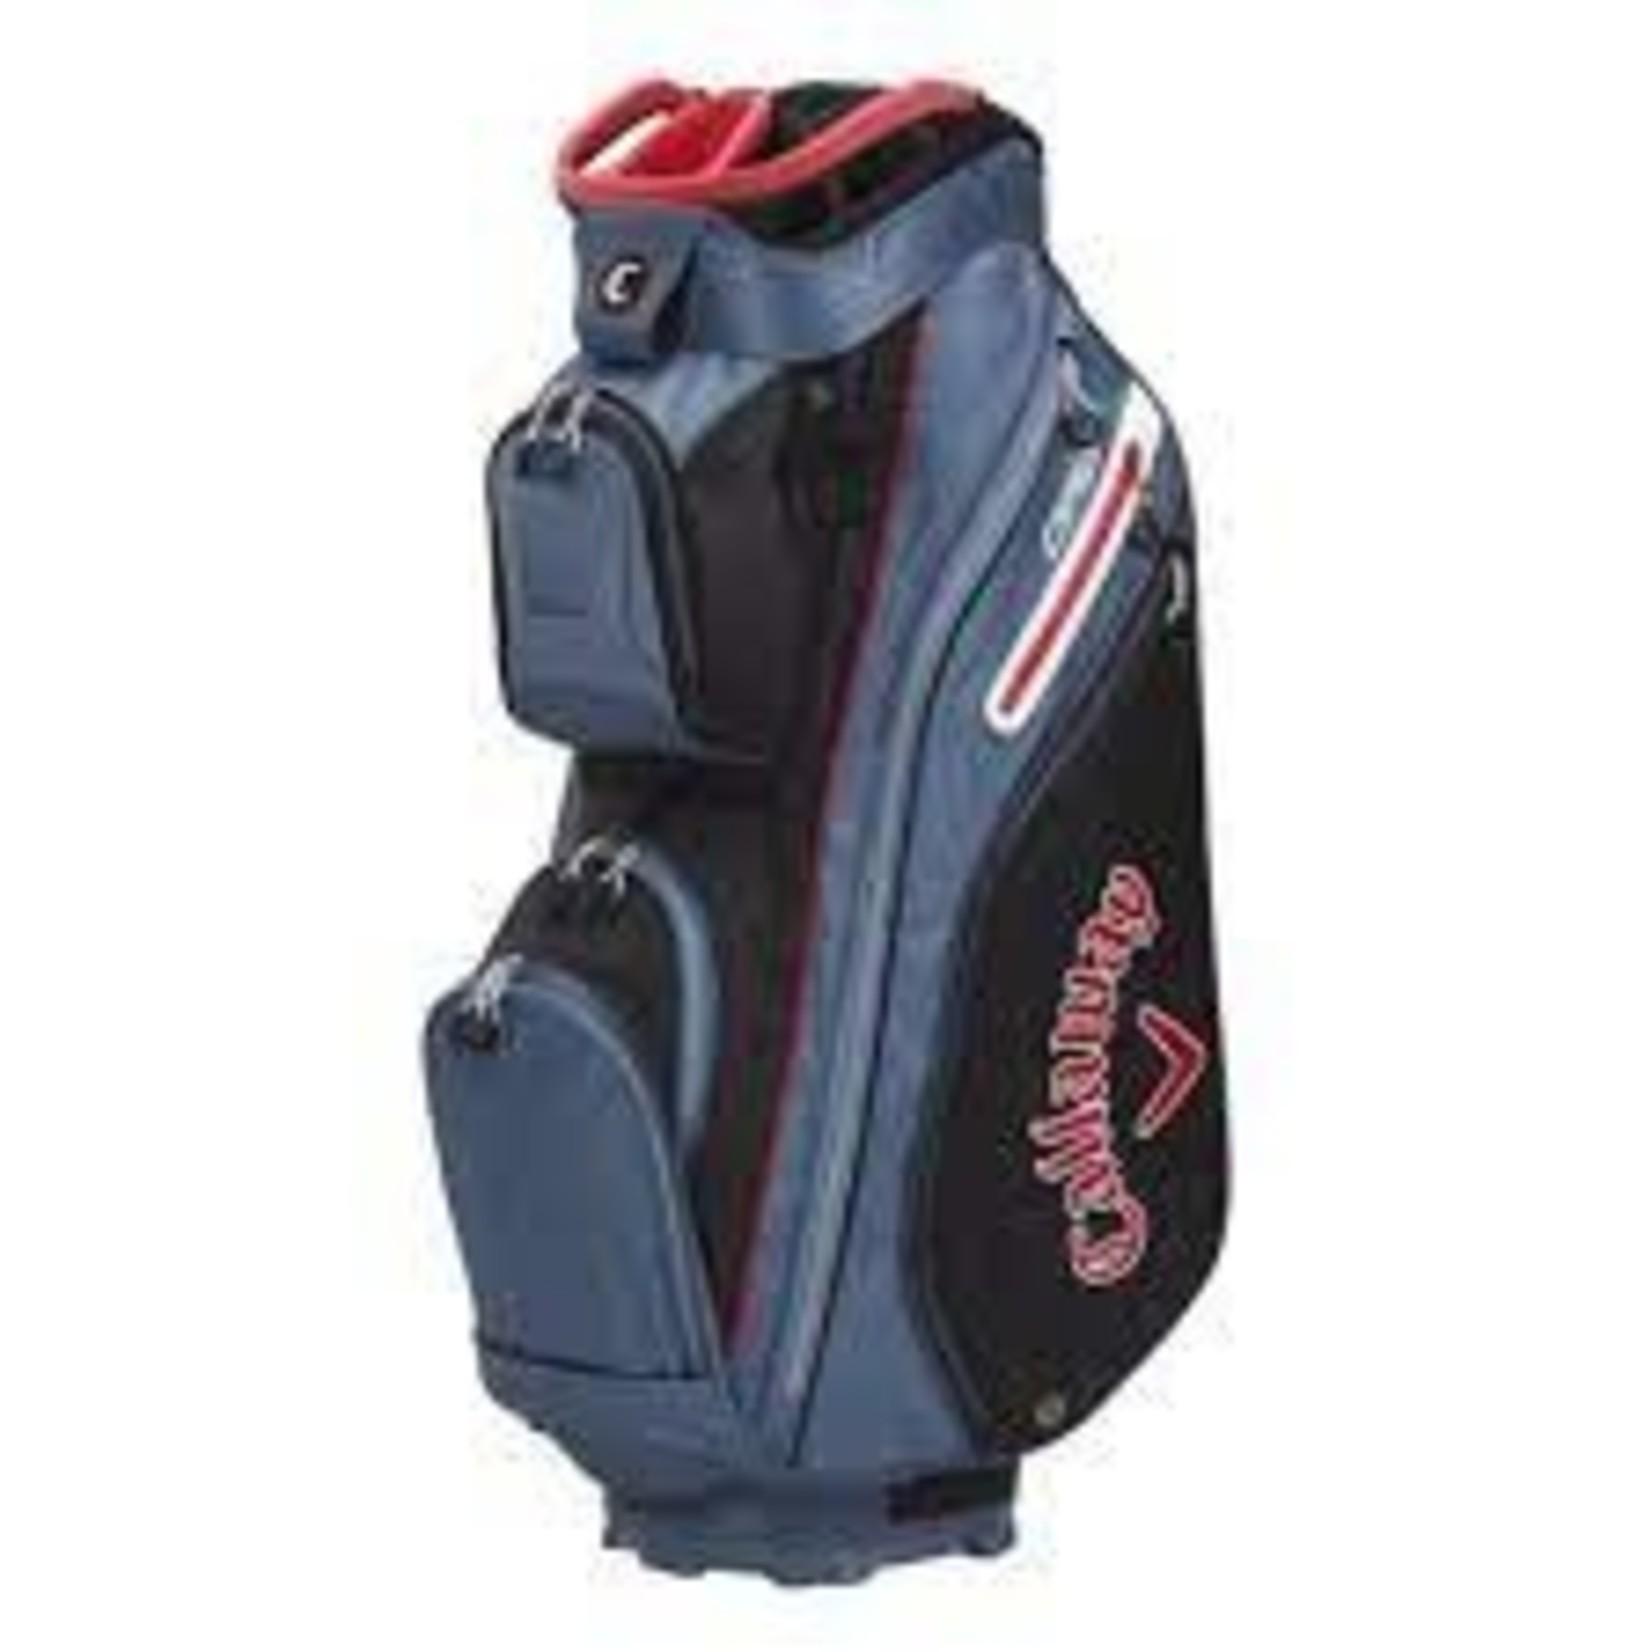 Callaway CALLAWAY ORG 14 CART BAG BLK/SHALE/RED